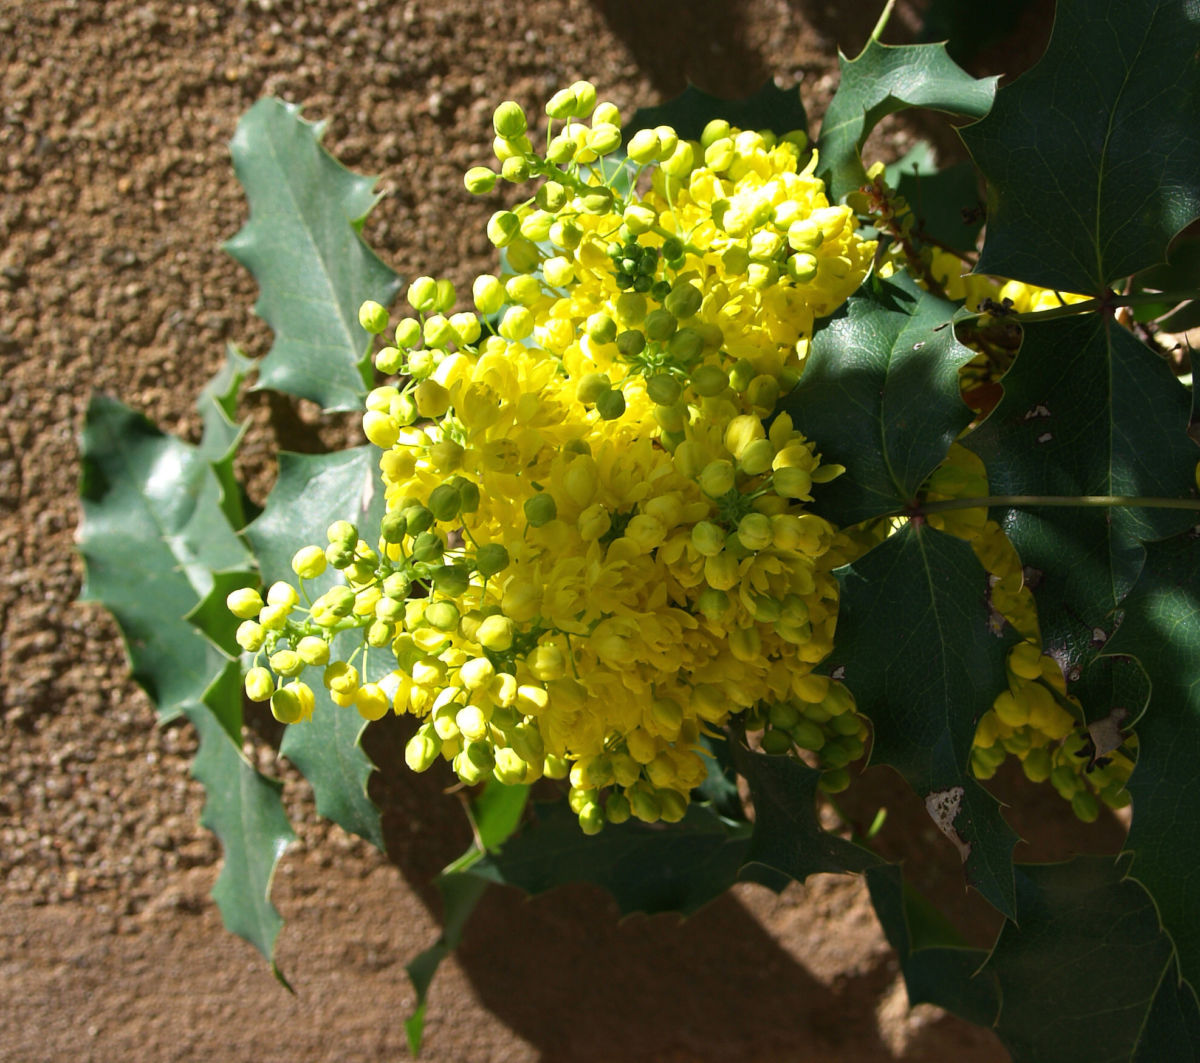 Mahonie Strauch immergruen Blute gelb Mahonia aquifolium